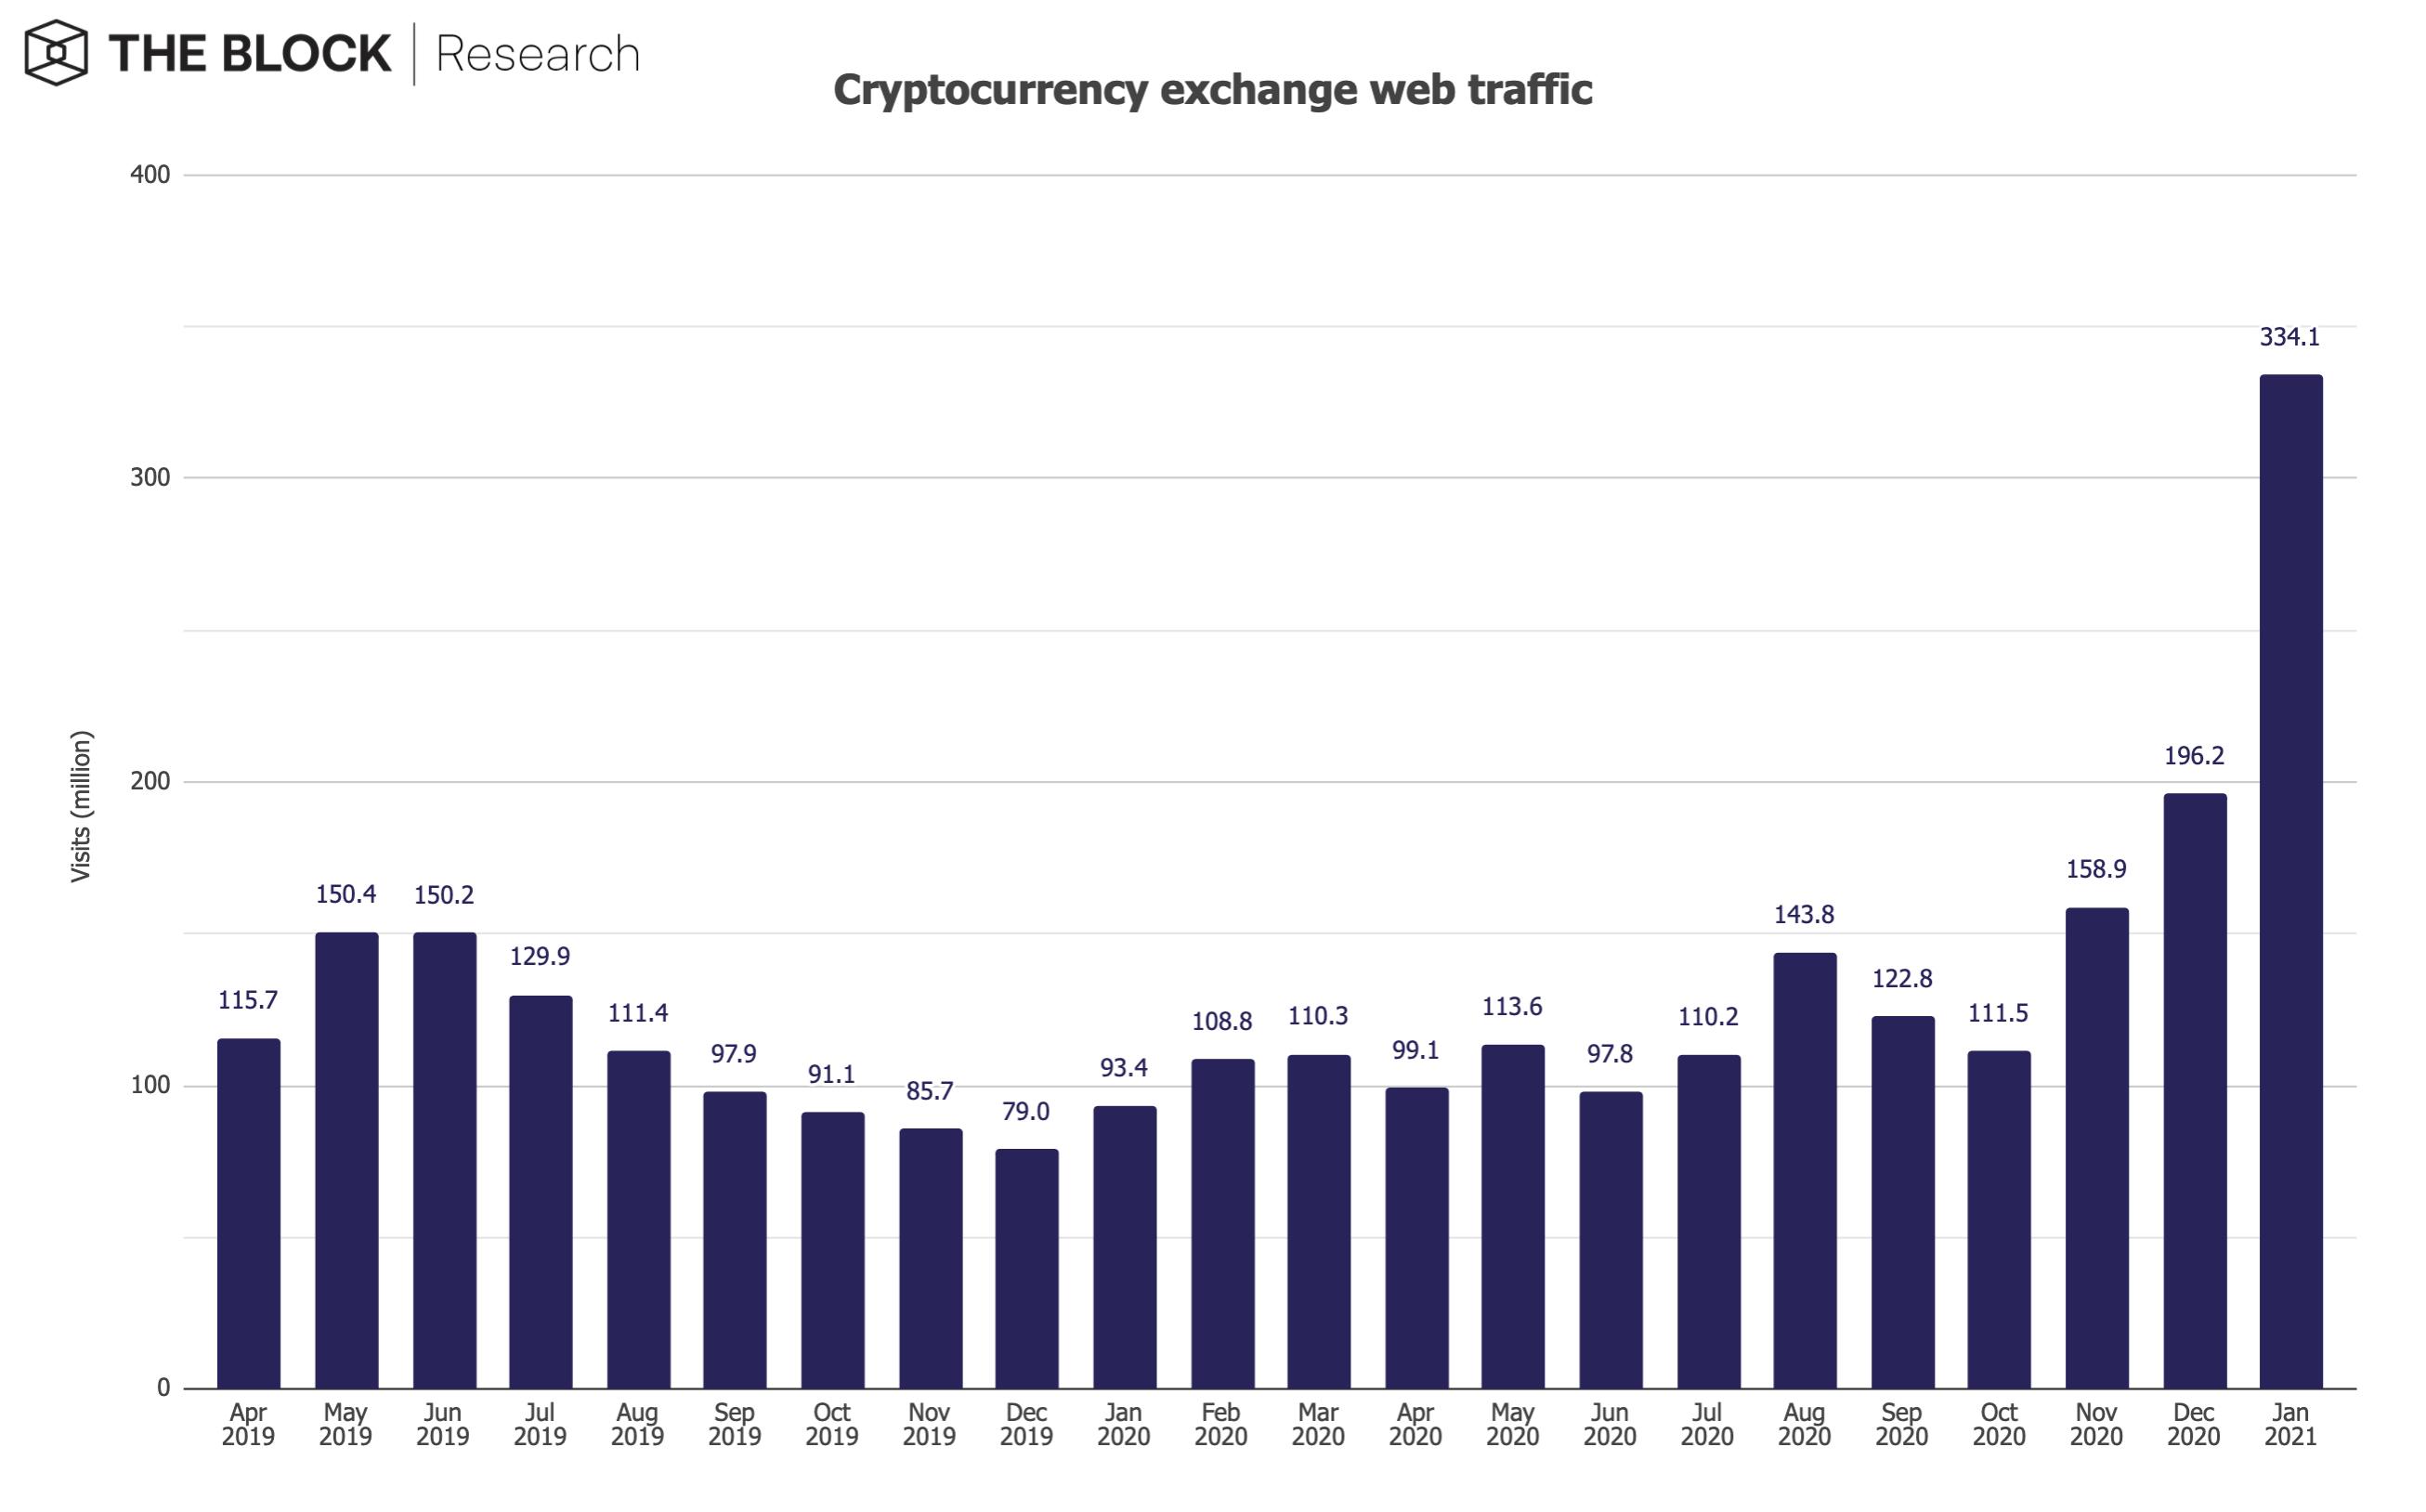 Crypto exchange web traffic